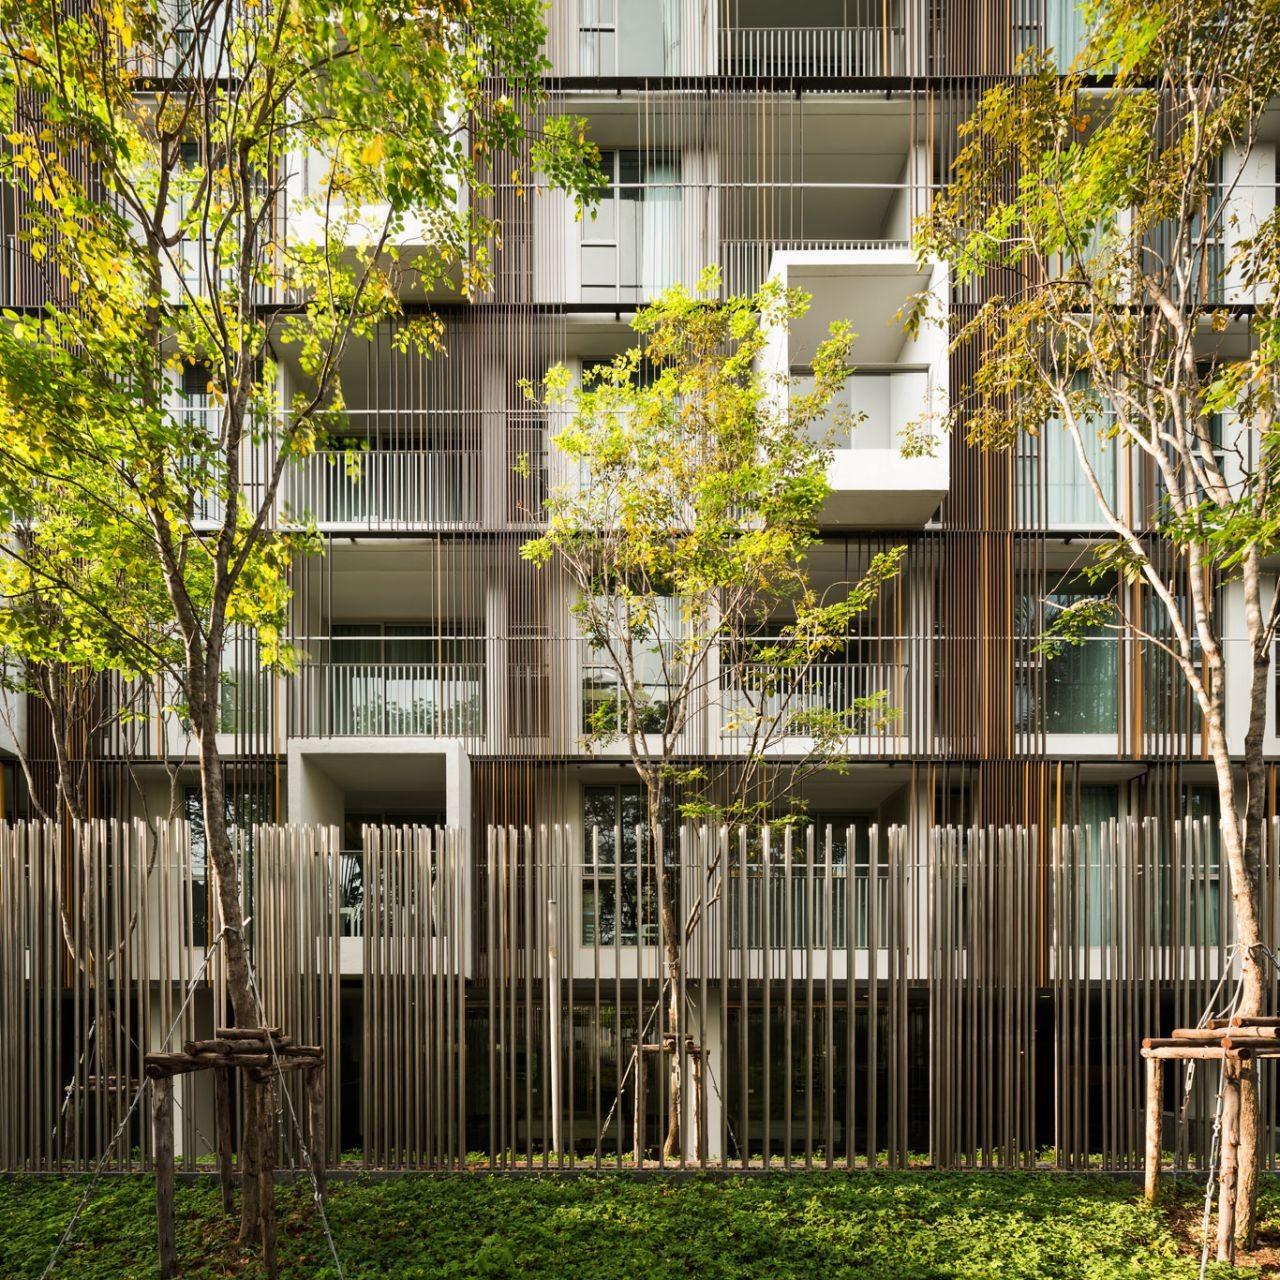 Gallery of via 31 somdoon architects ltd 4 for Architect ltd